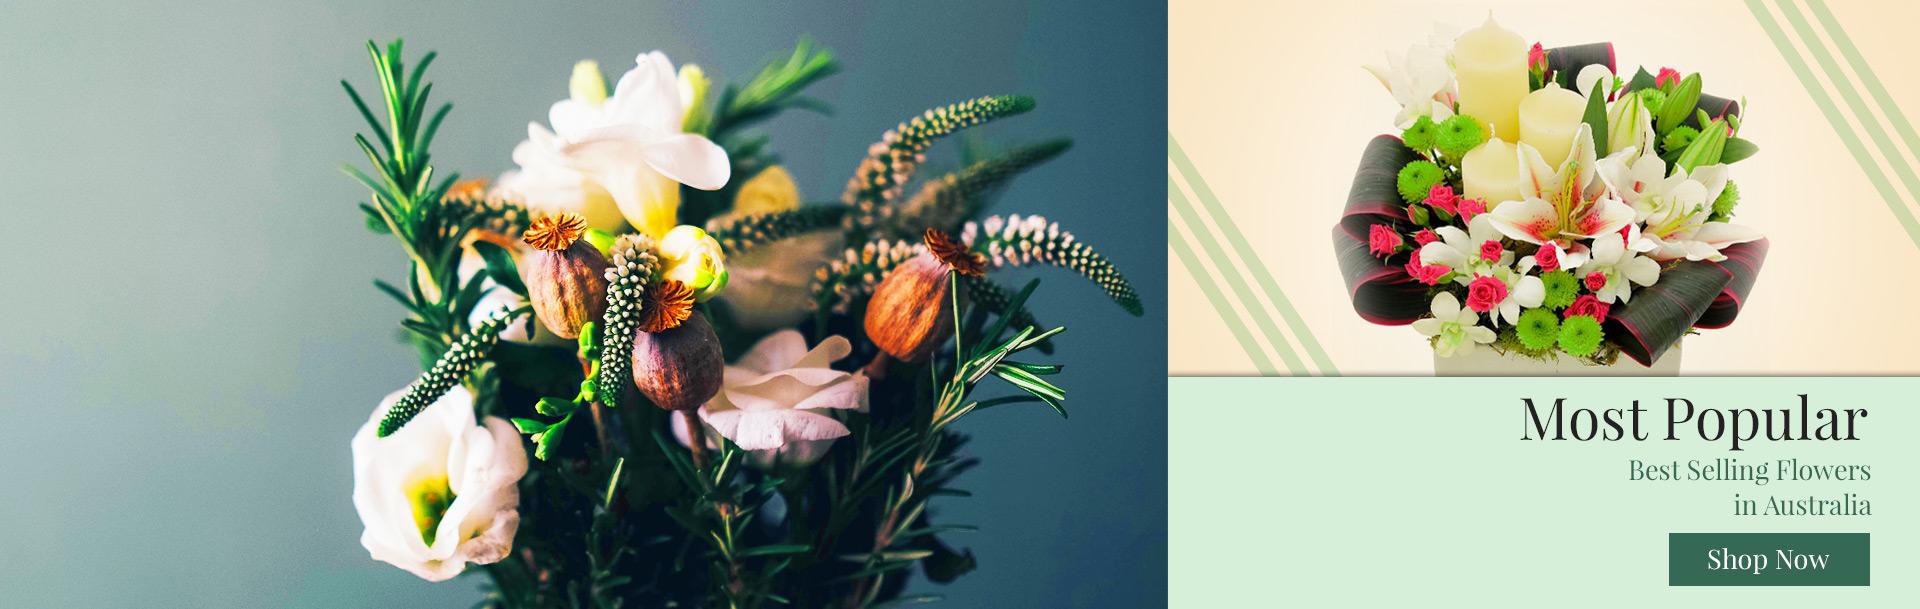 Florists Helensvale Flowers Online Gold Coast Flower Delivery